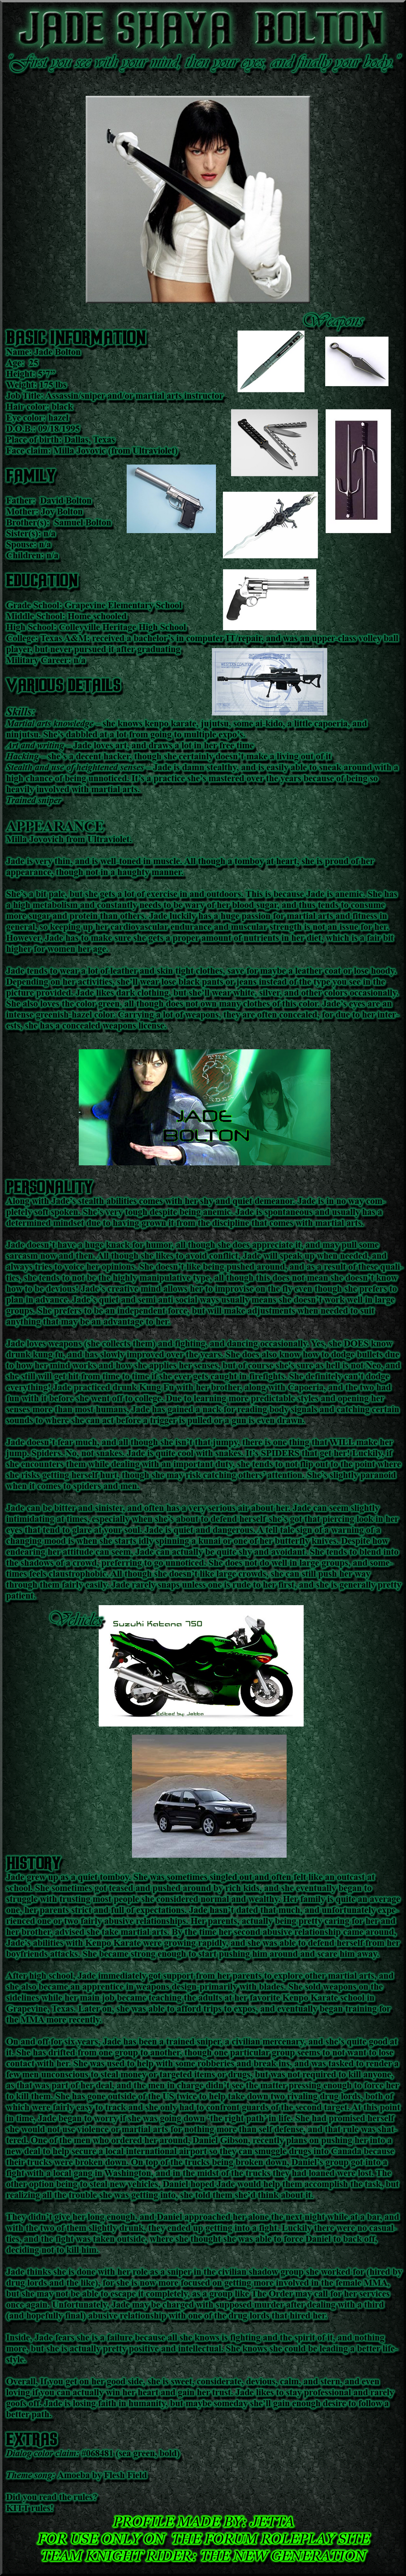 Jade  Bolton bio: TKR version by Jetta-Windstar